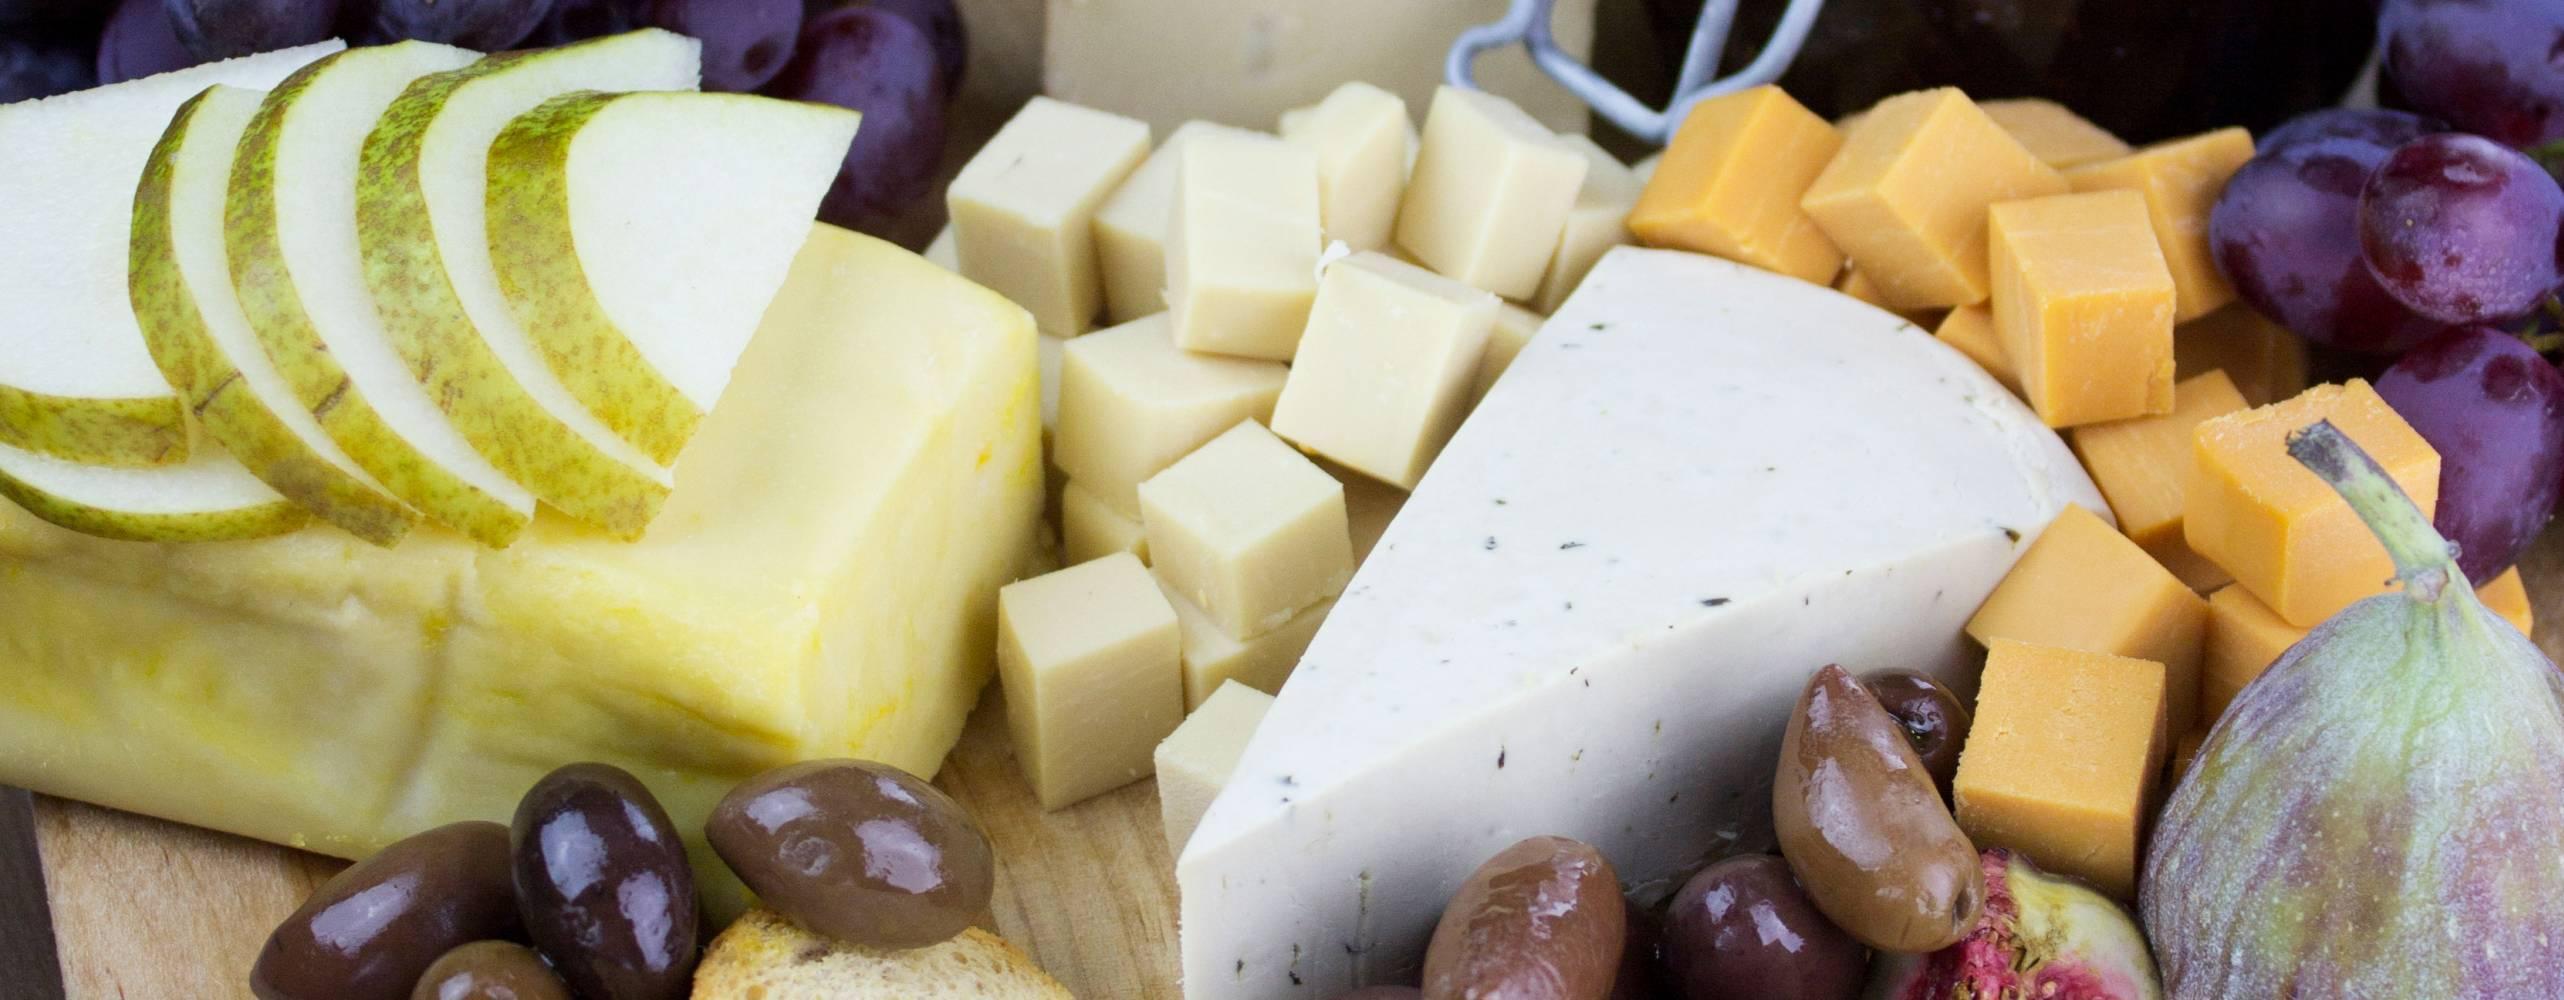 vegansk ost som smälter